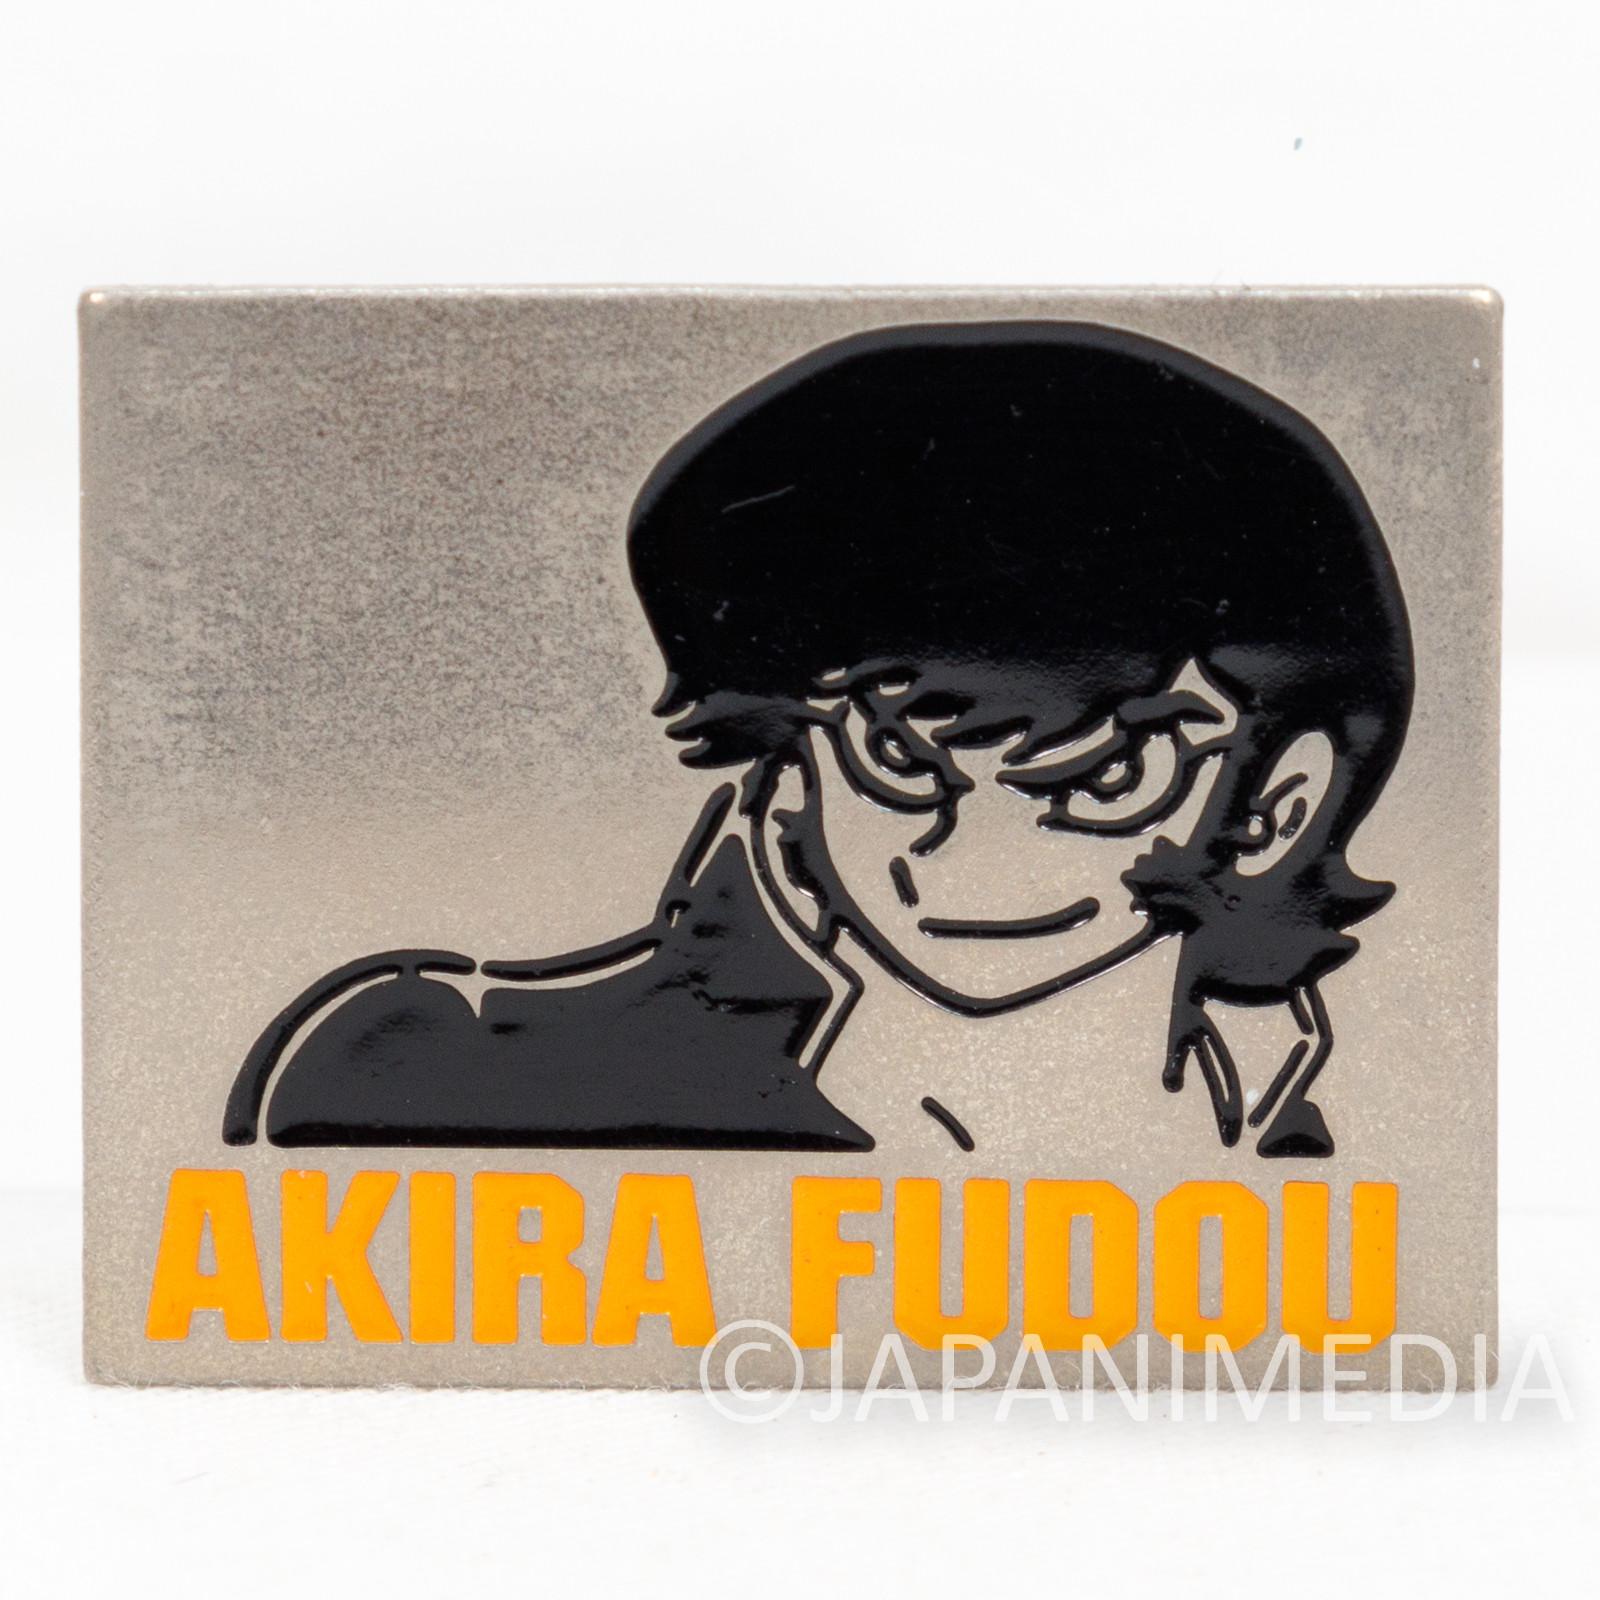 Devilman Akira Fudo Metal Pins JAPAN ANIME MANGA NAGAI GO